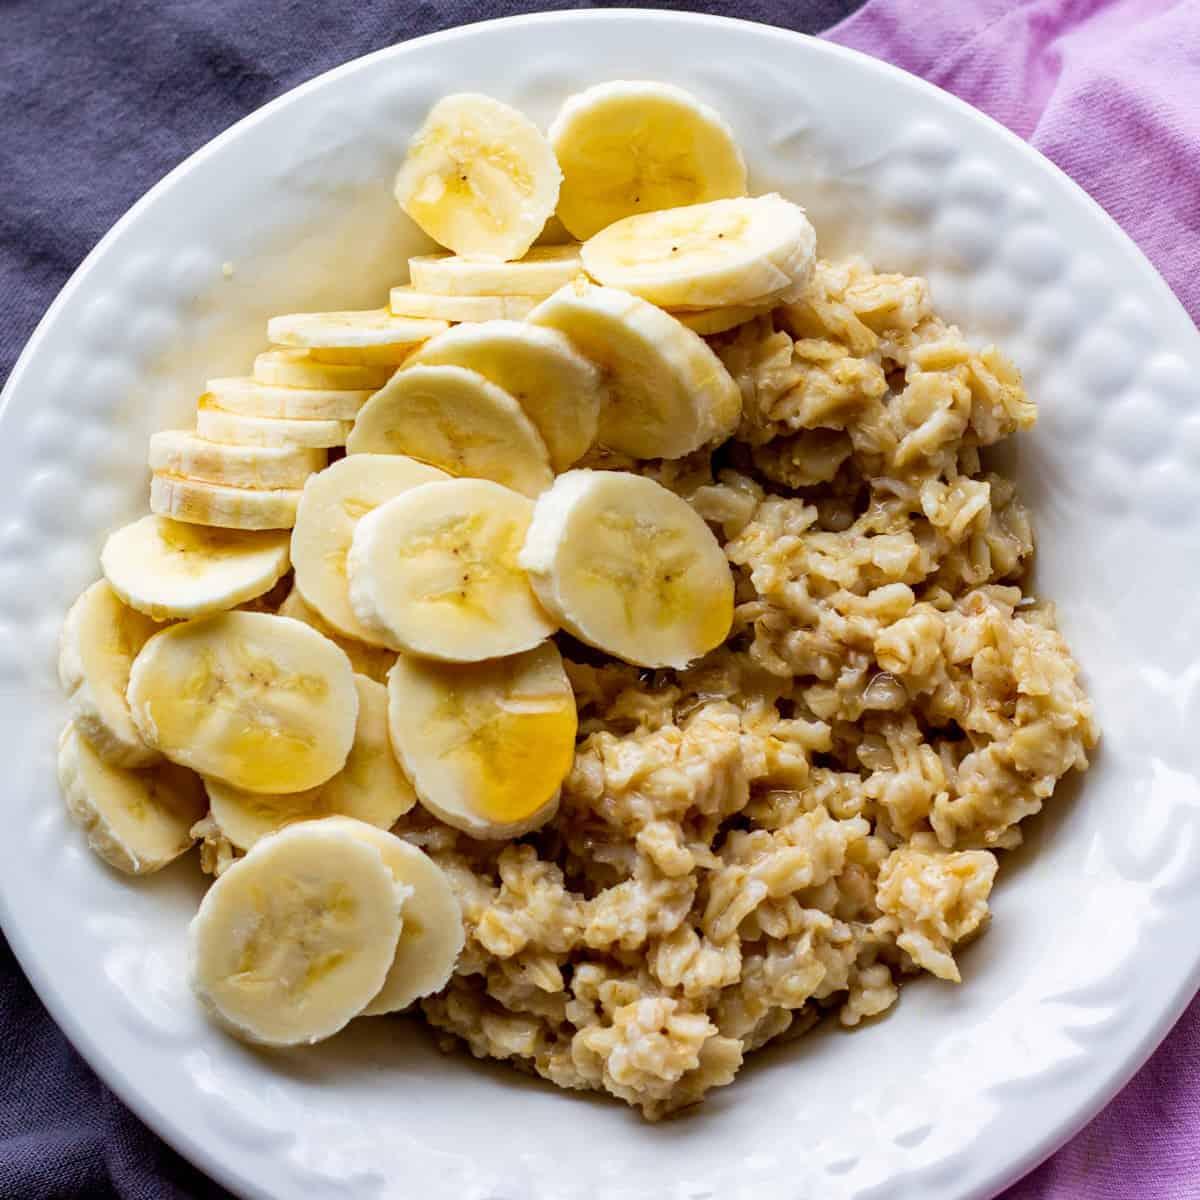 oatmeal with sliced bananas